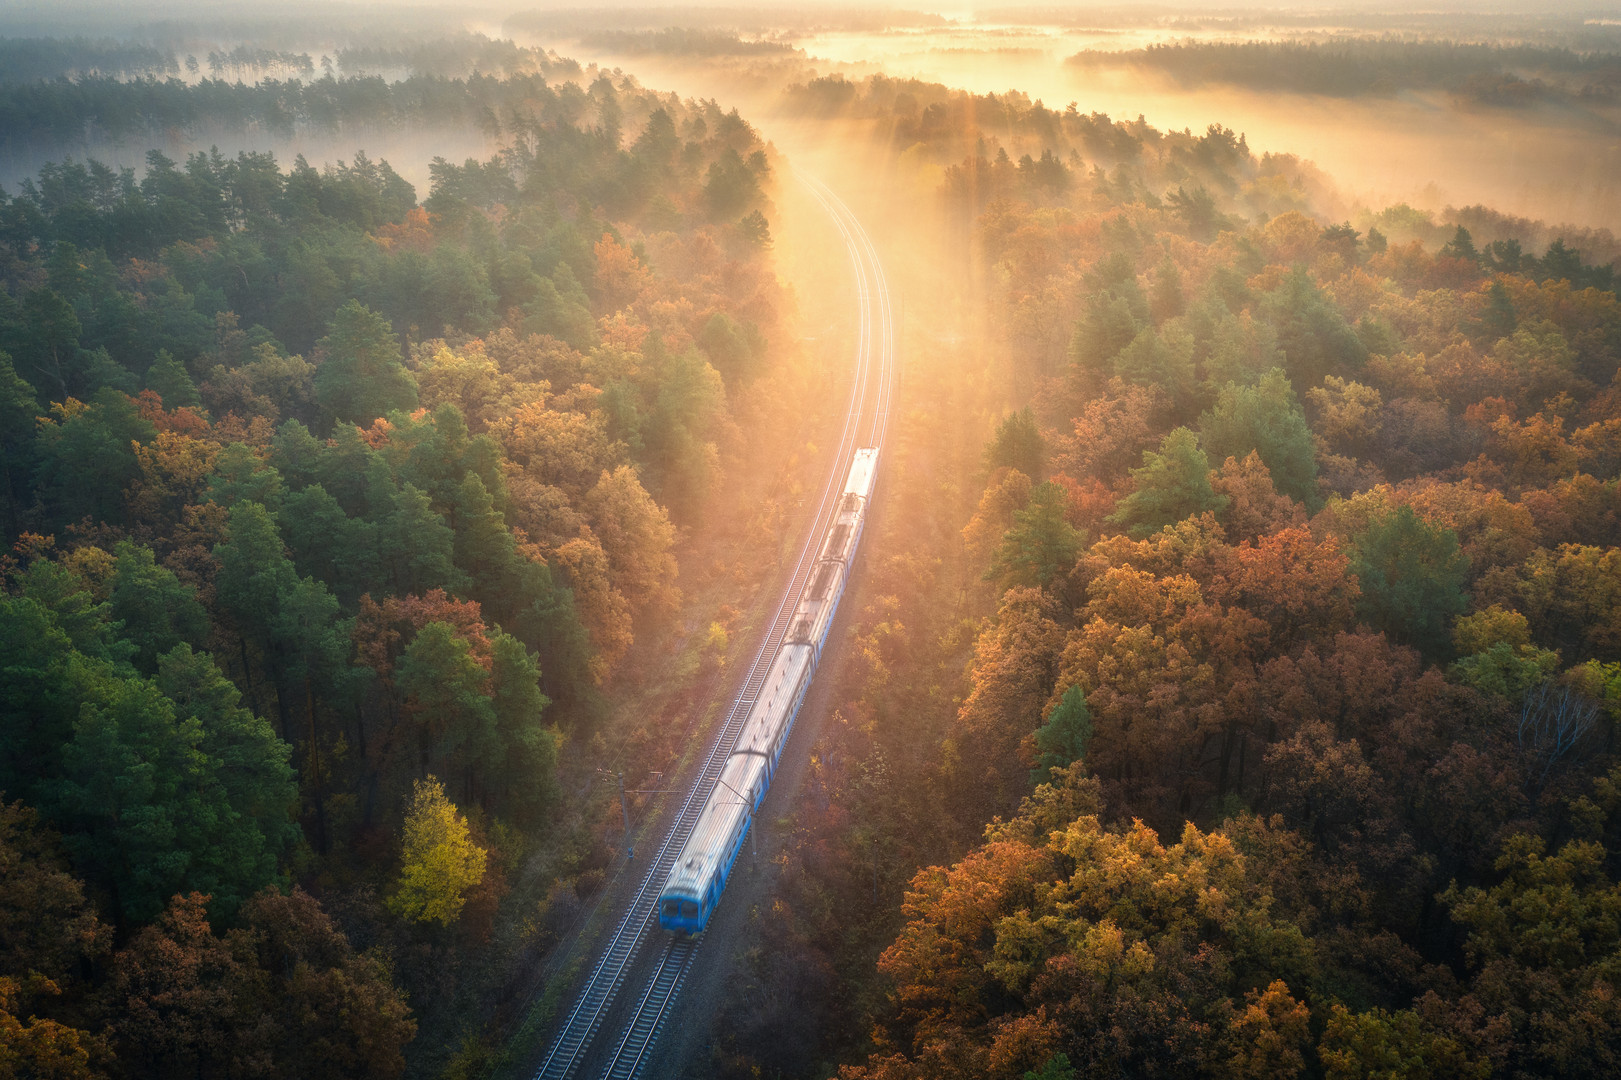 bigstock-Train-In-Beautiful-Forest-In-F-